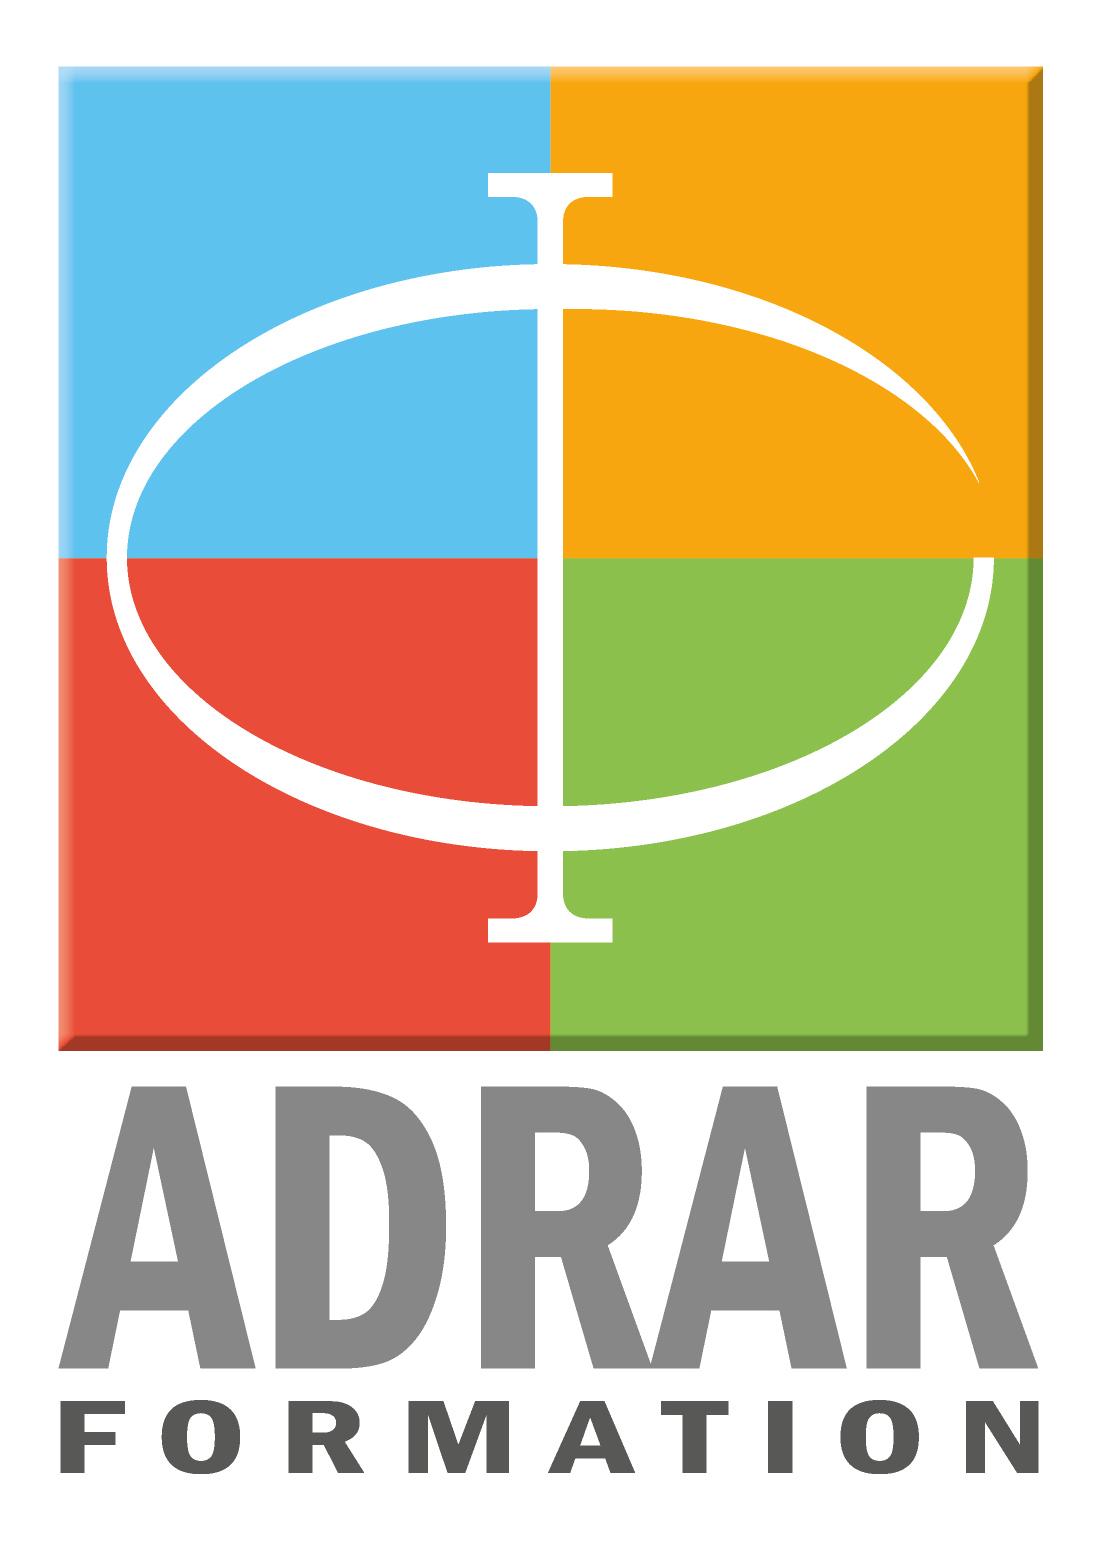 ADRAR